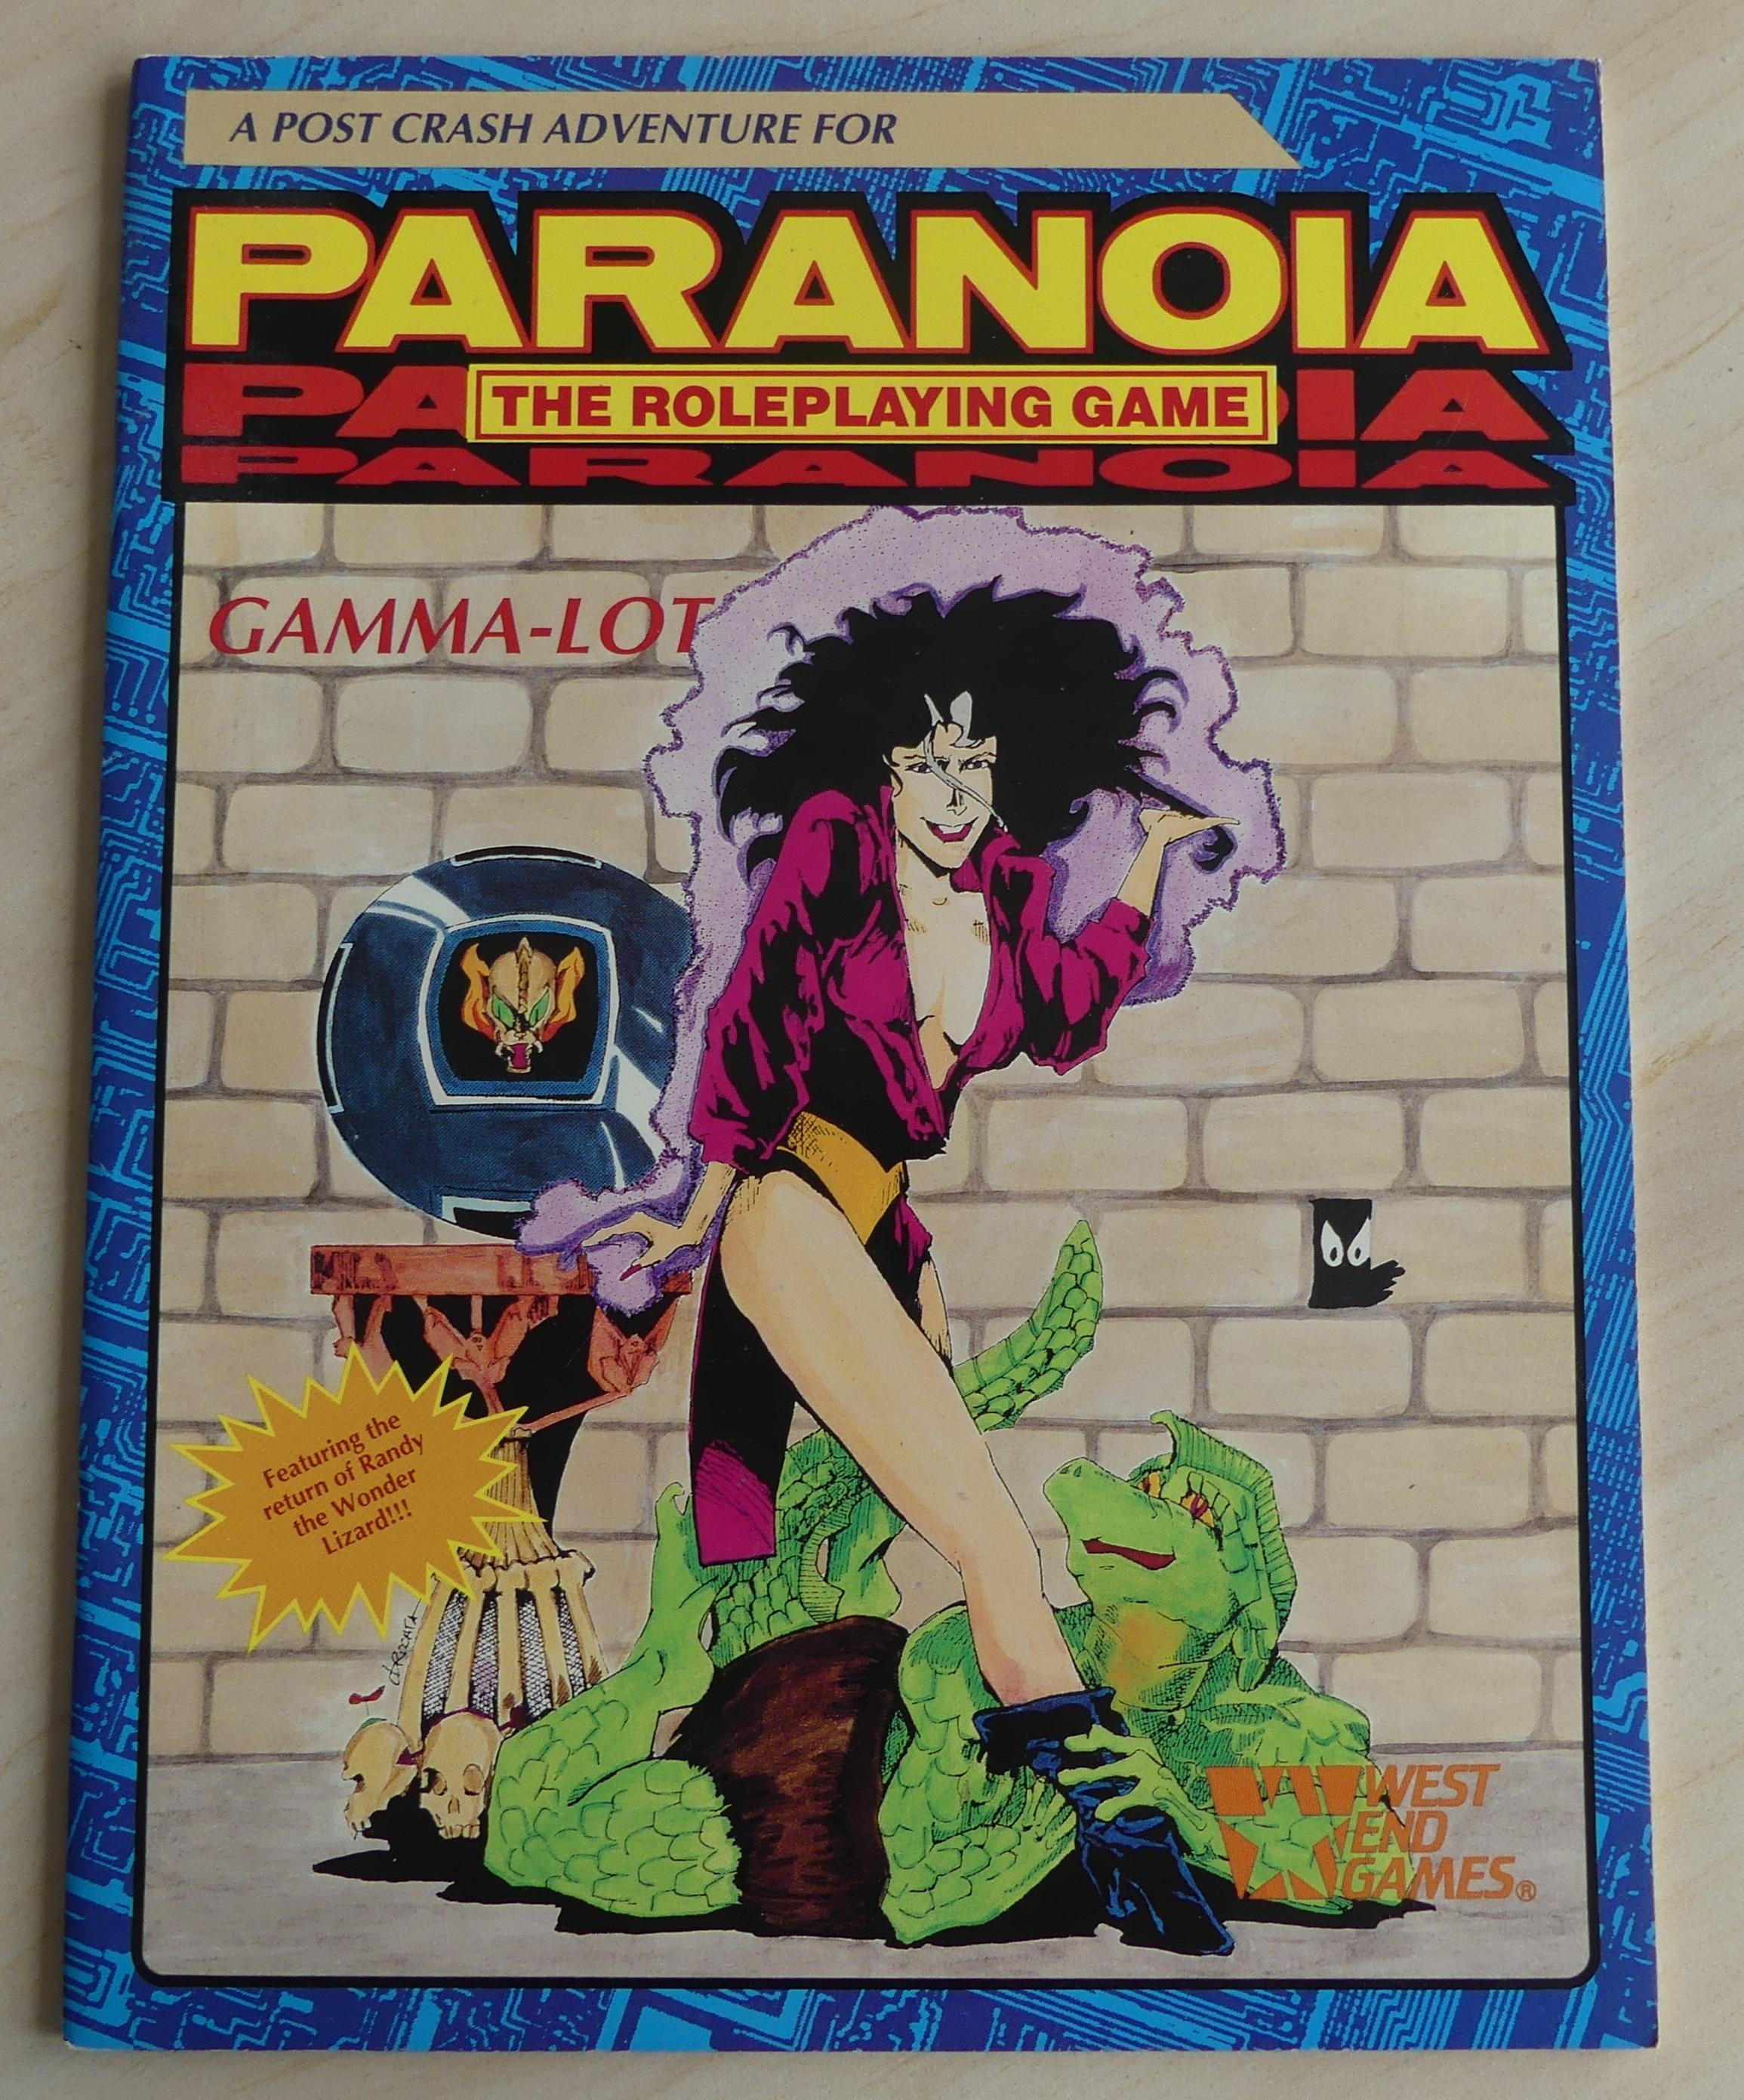 a post-crash adventure for paranoia: Gamma-Lot